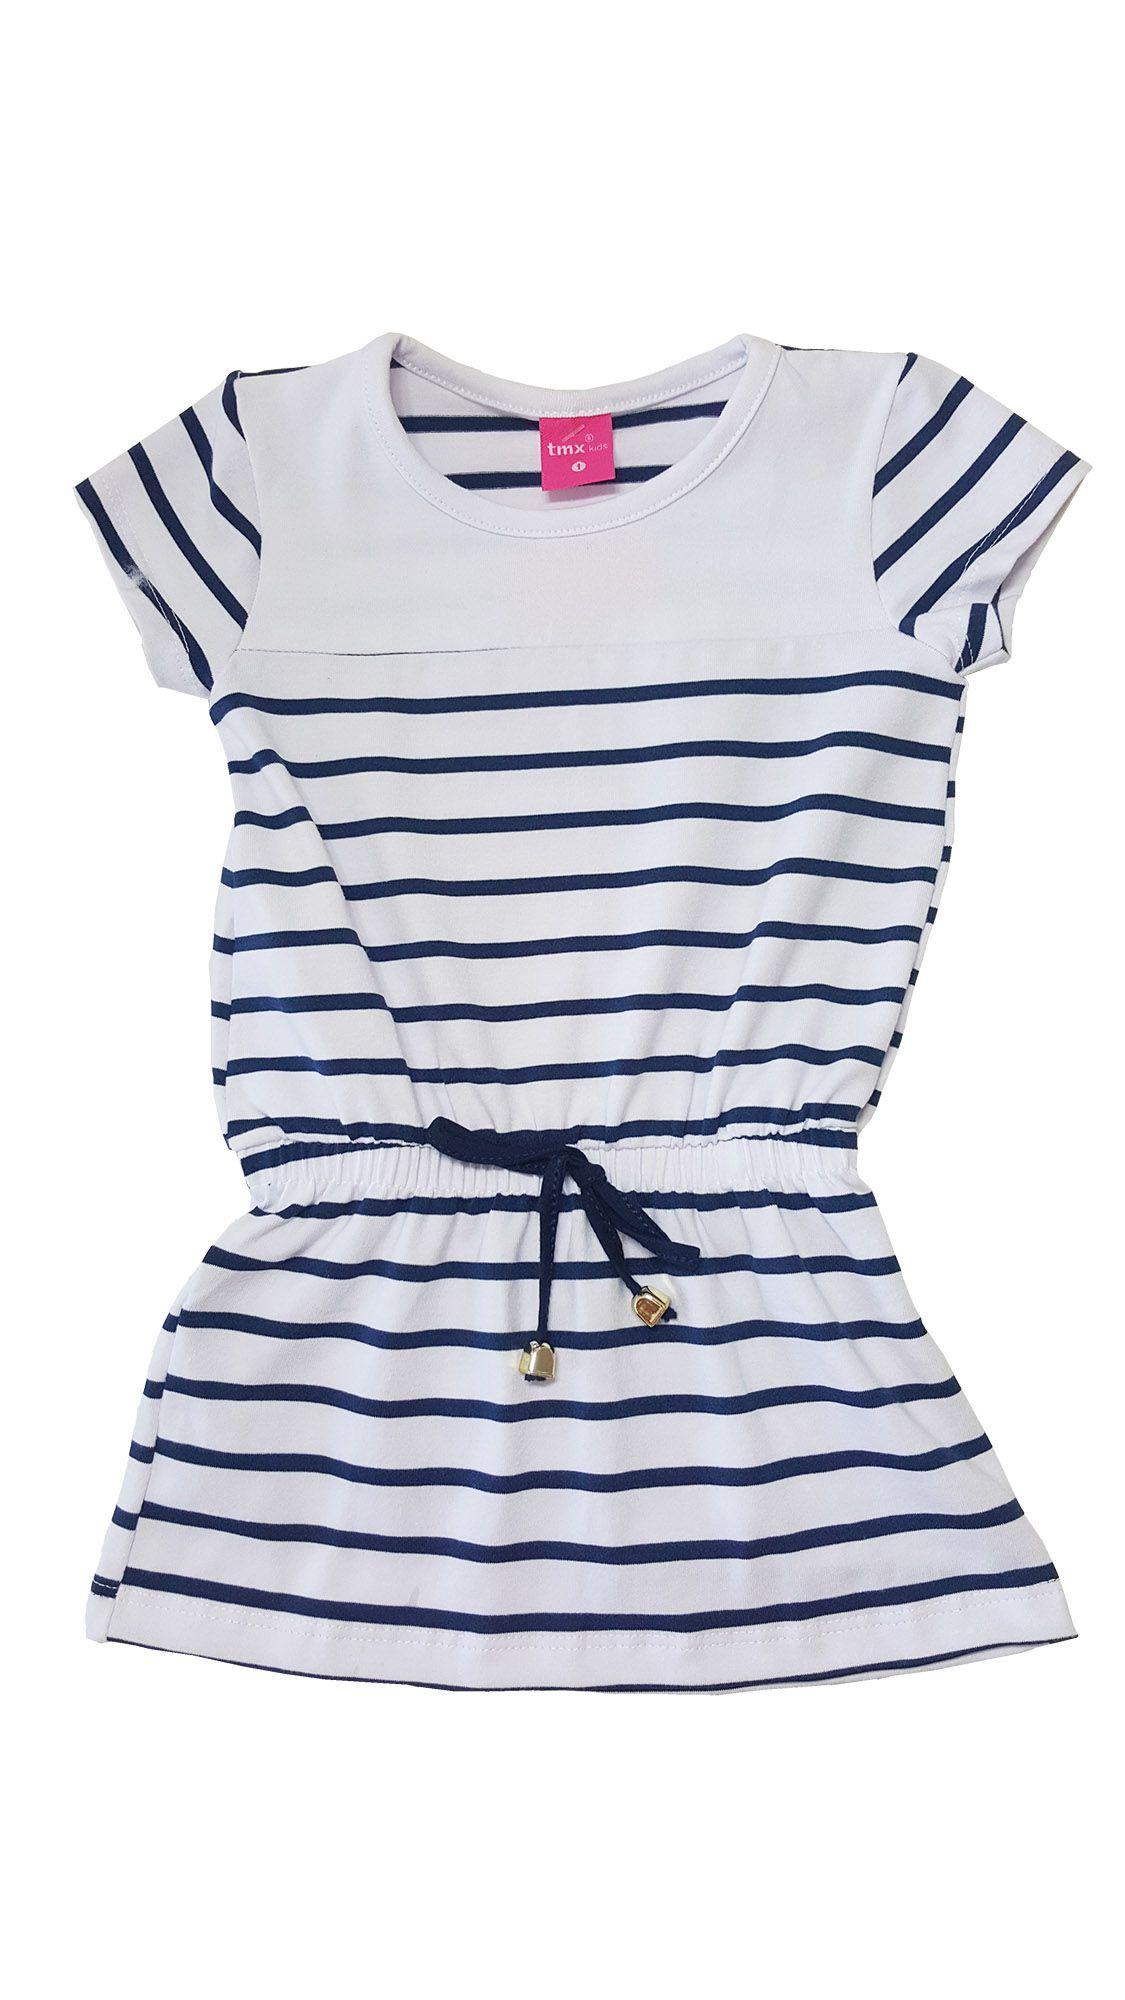 Vestido Infantil TMX  Listrado Branco / Tamanho 8